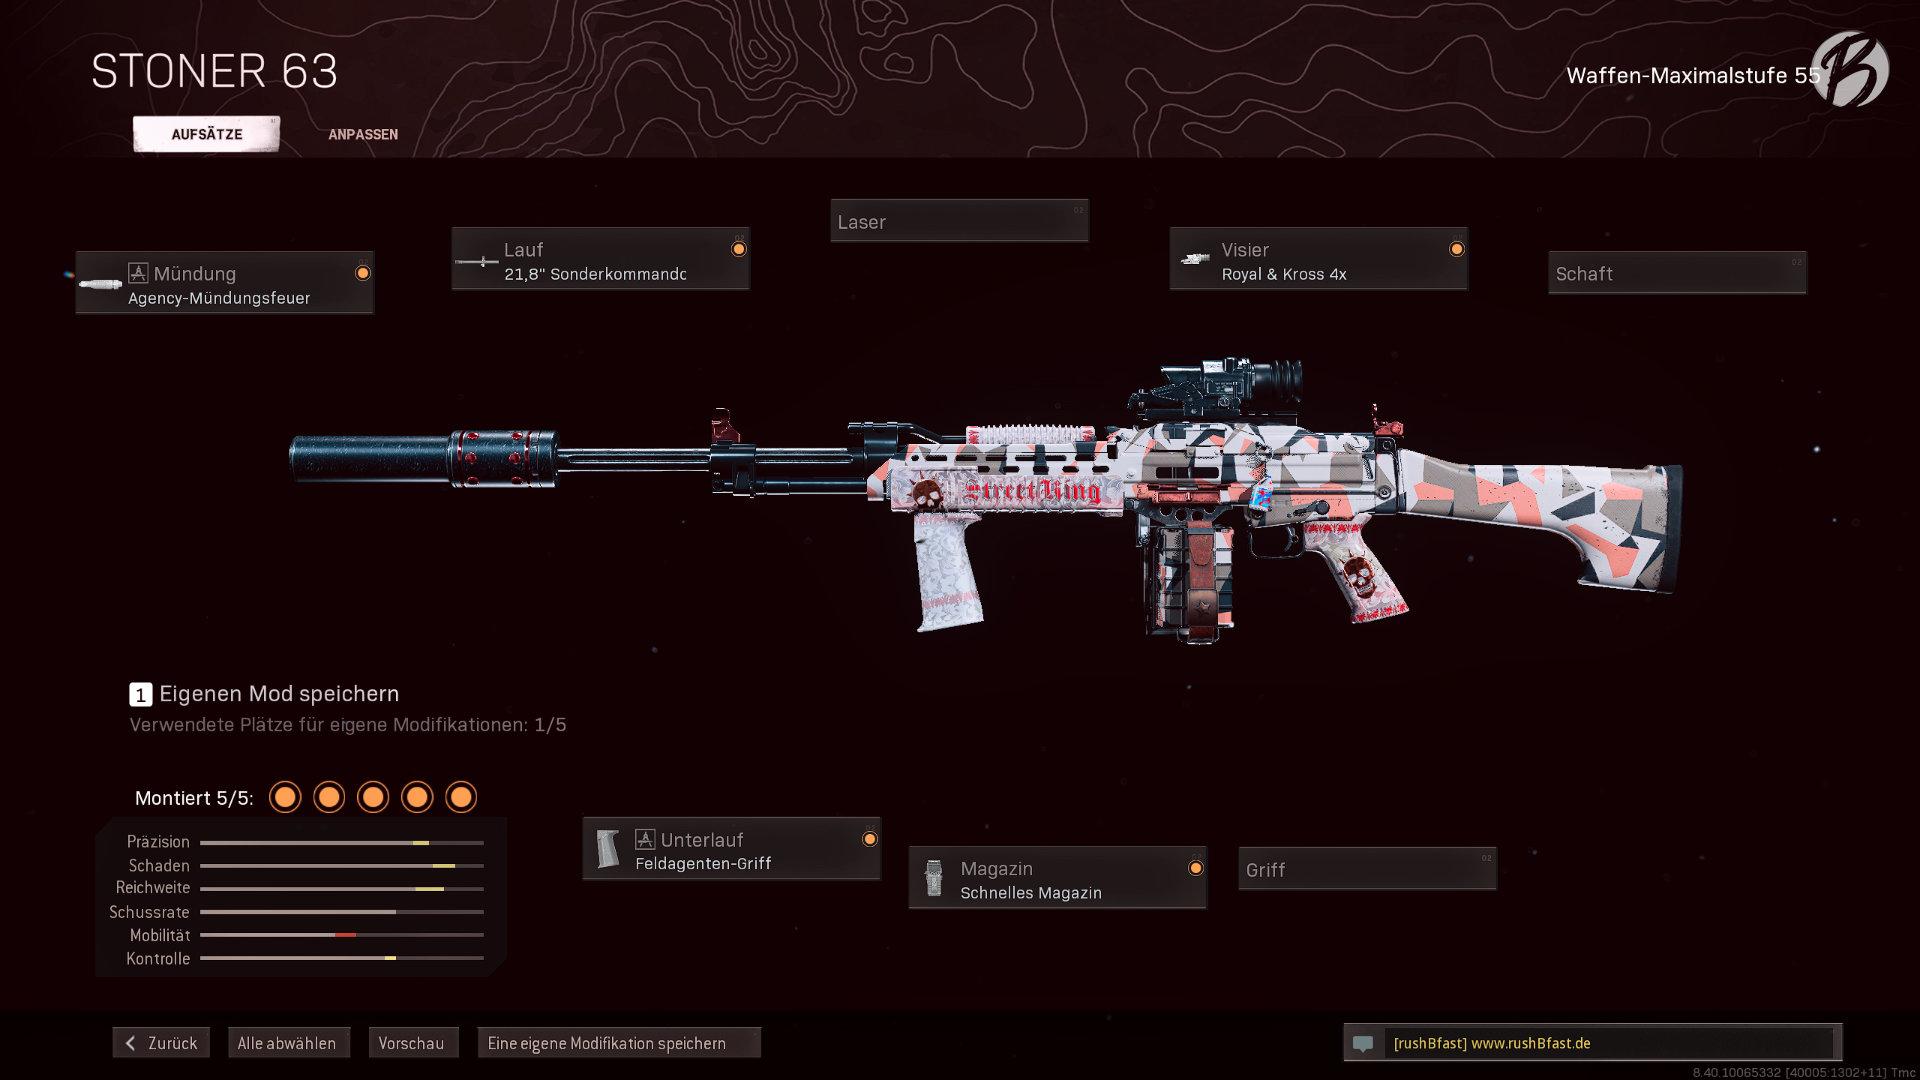 Call of Duty Warzone - Cold War Season 5 - Stoner 63 (deutsch)